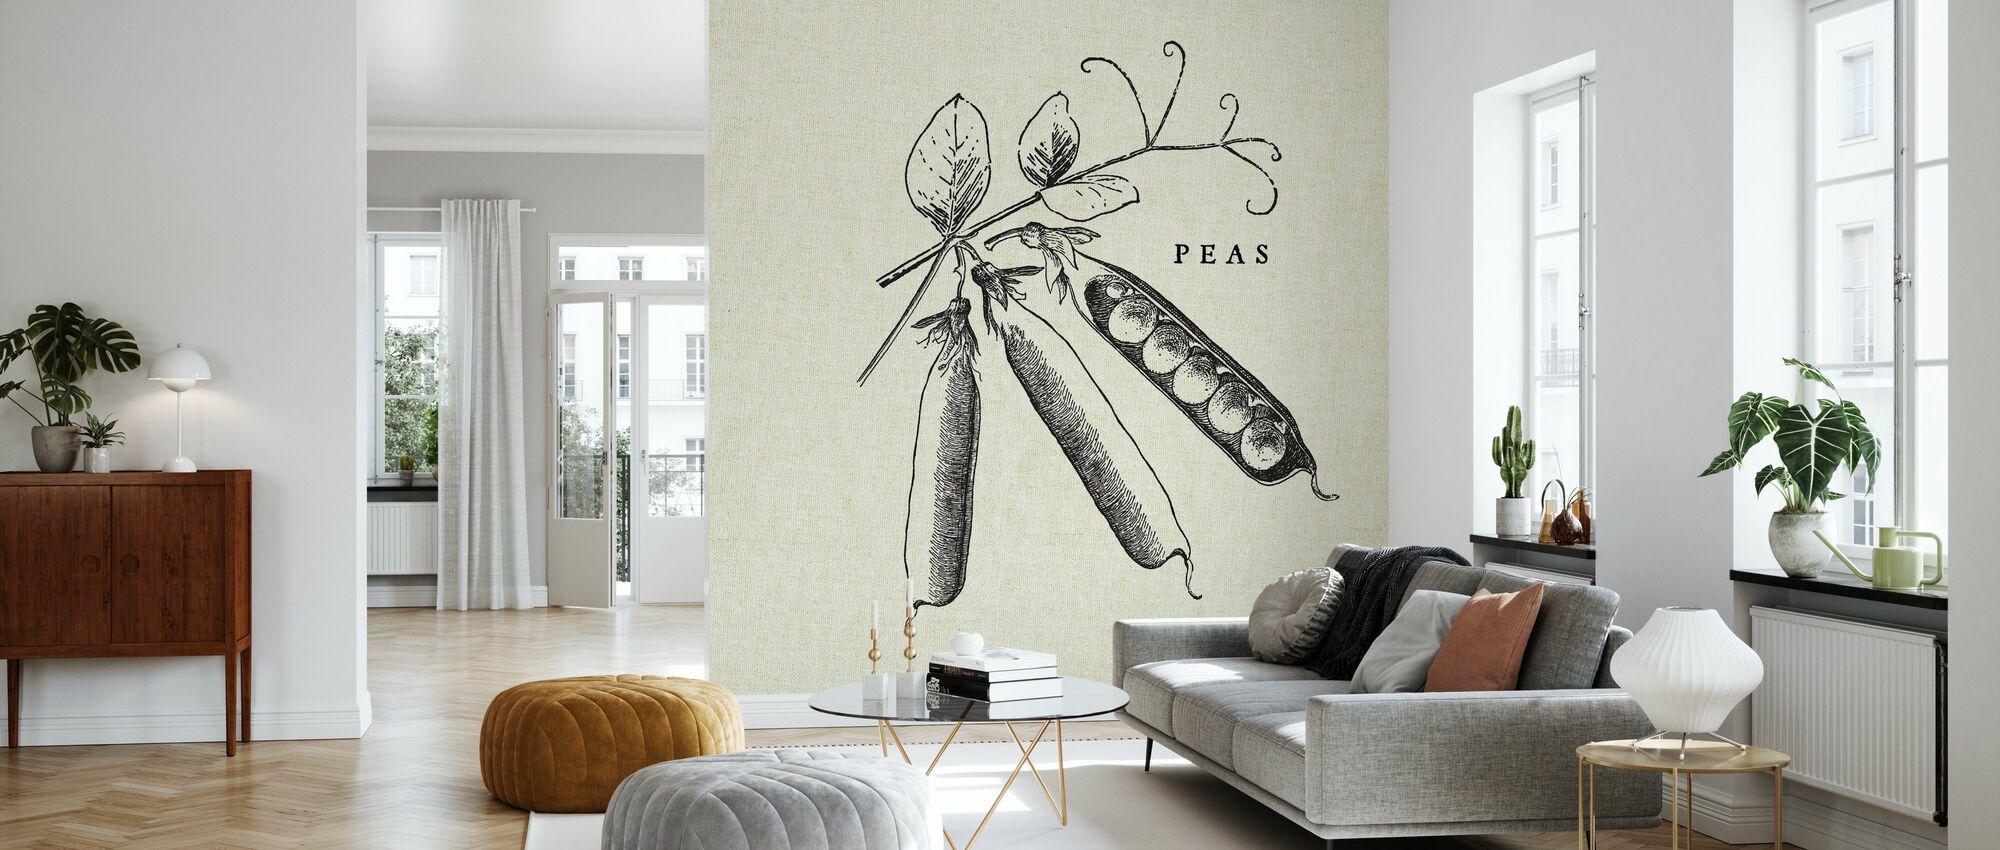 Ilustración de cocina - Peas - Papel pintado - Salón